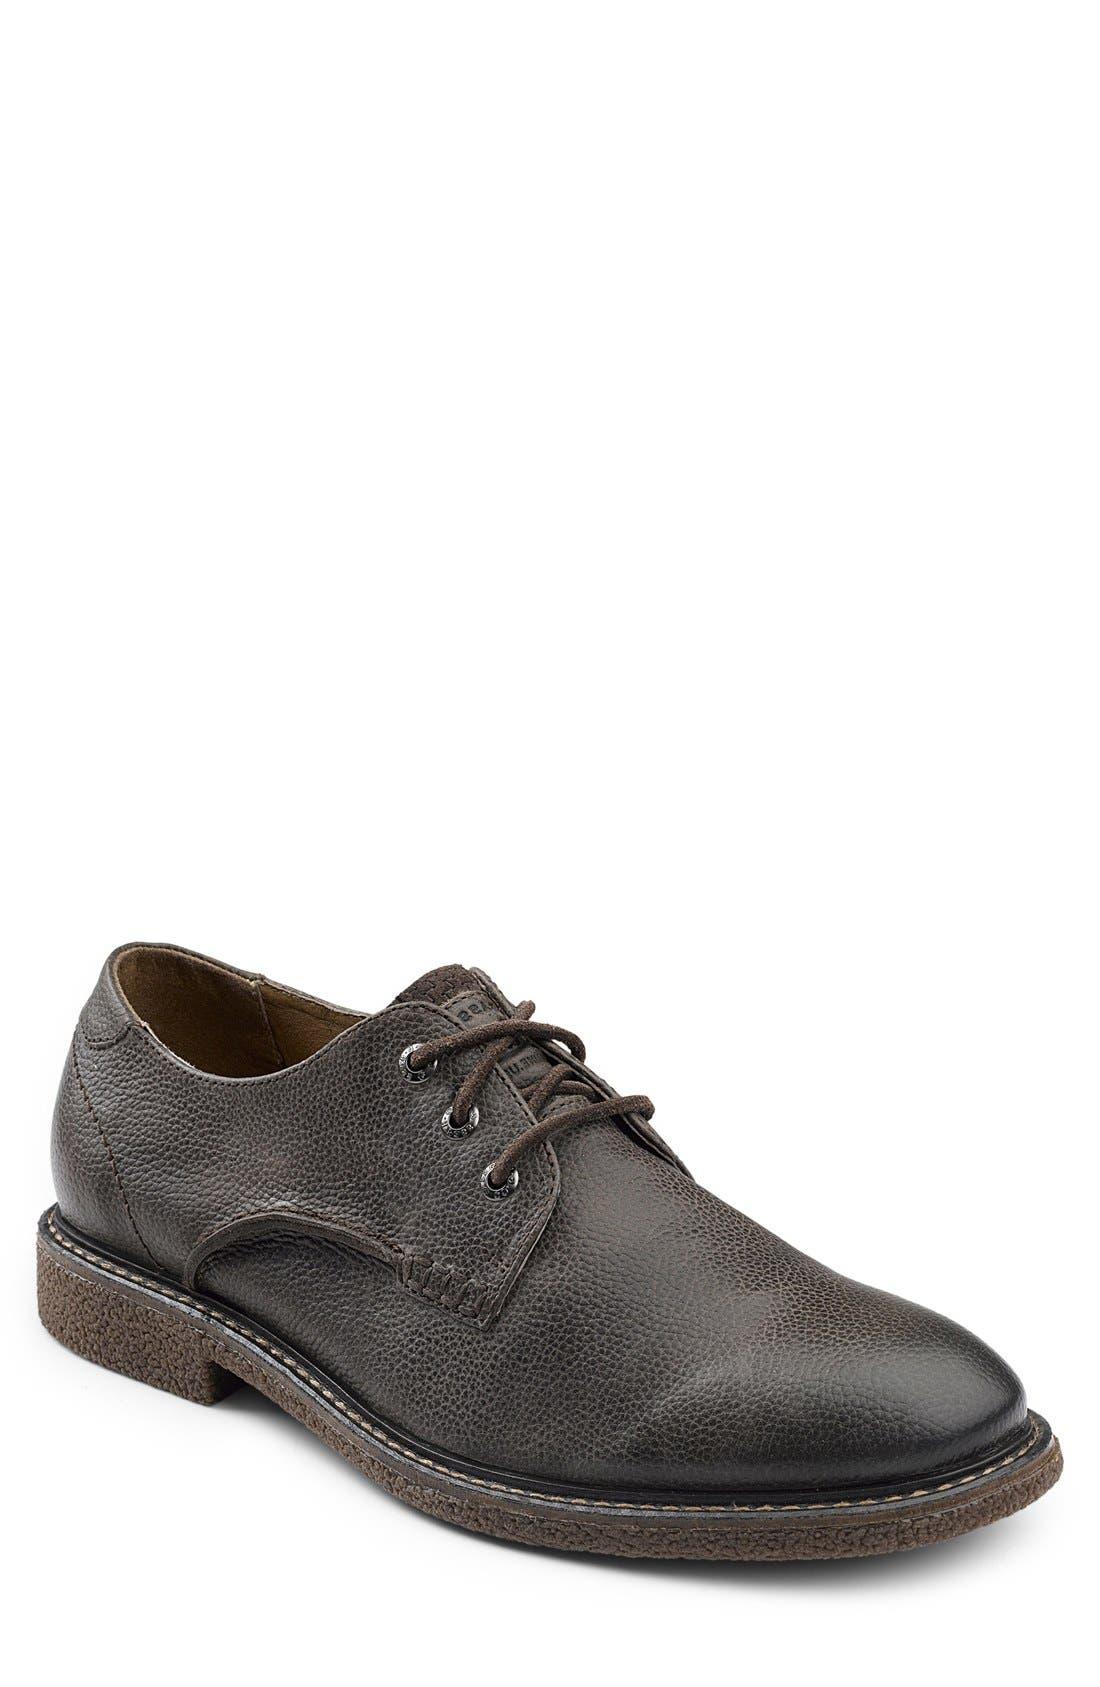 'Bruno' Plain Toe Derby,                         Main,                         color, 200